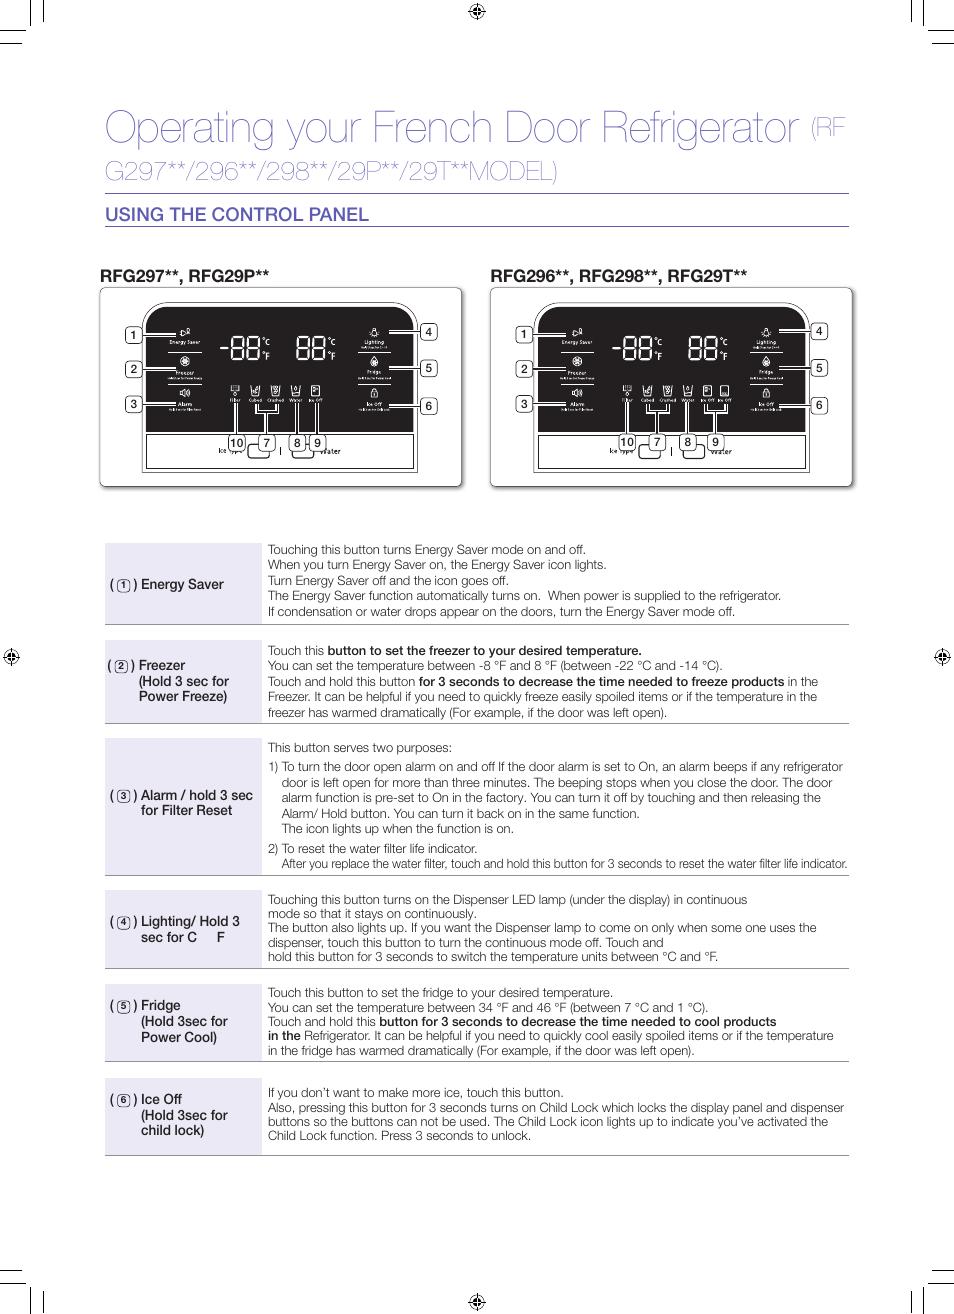 operating your french door refrigerator using the control panel rh manualsdir com Samsung RFG297 Door Parts Samsung RFG297 Owner's Manual